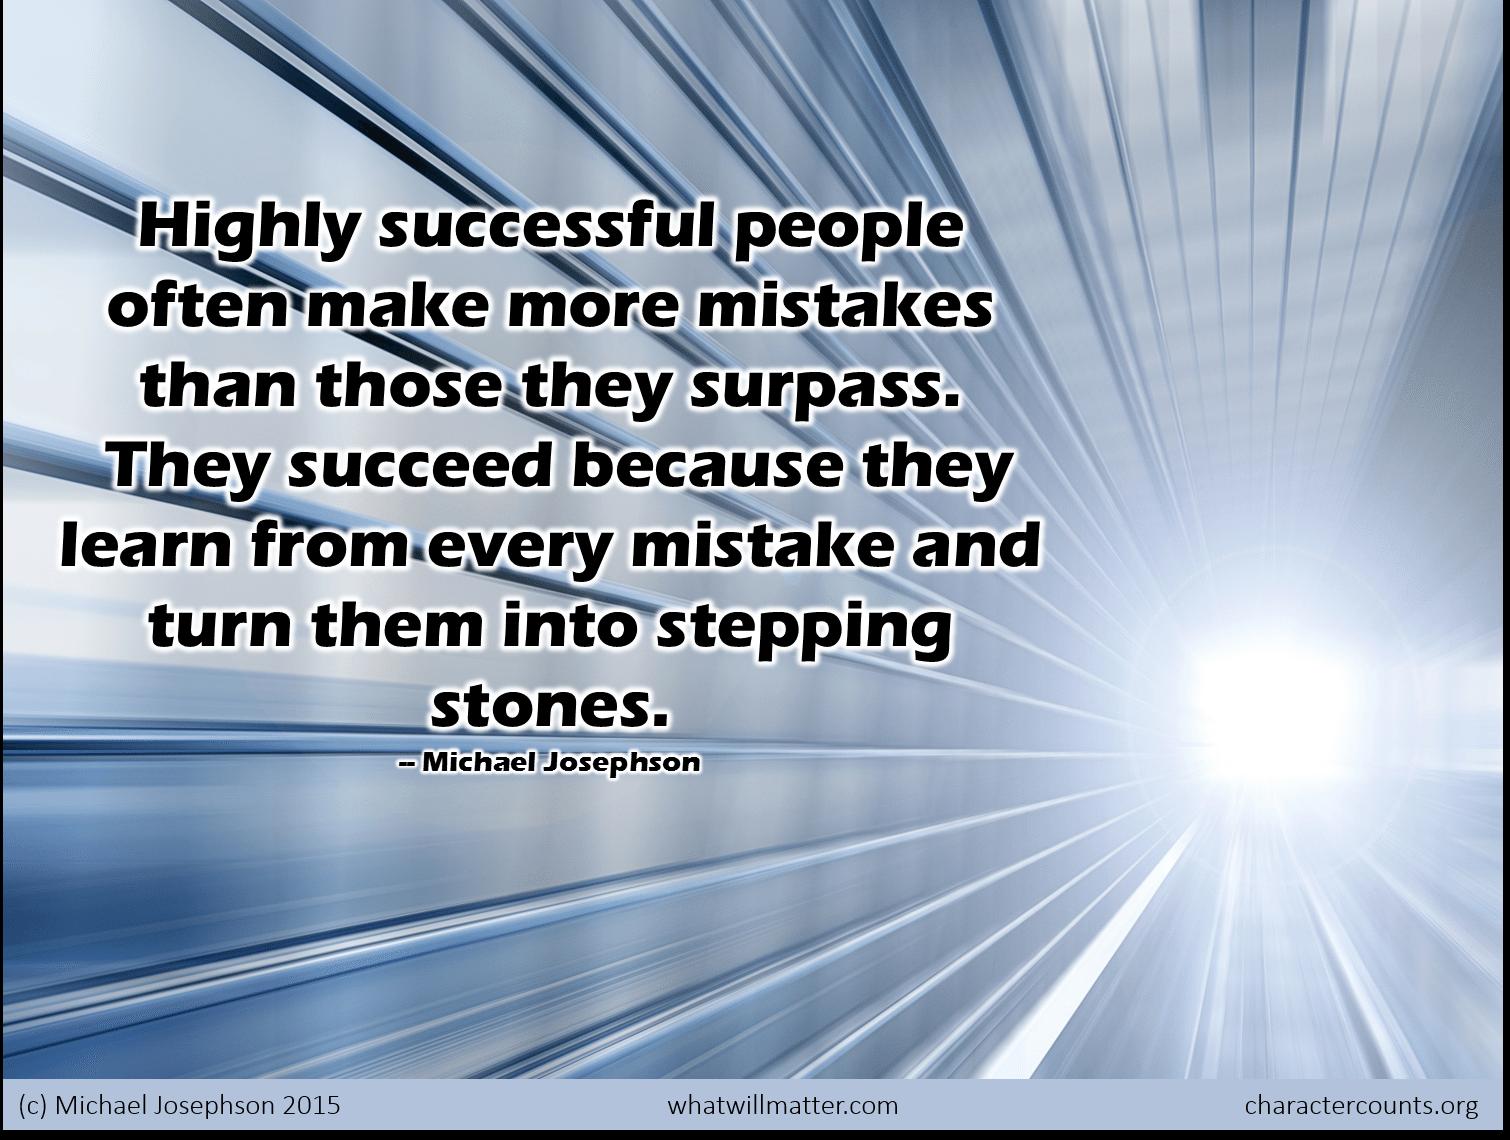 Using Stumbling Blocks as Stepping Stones